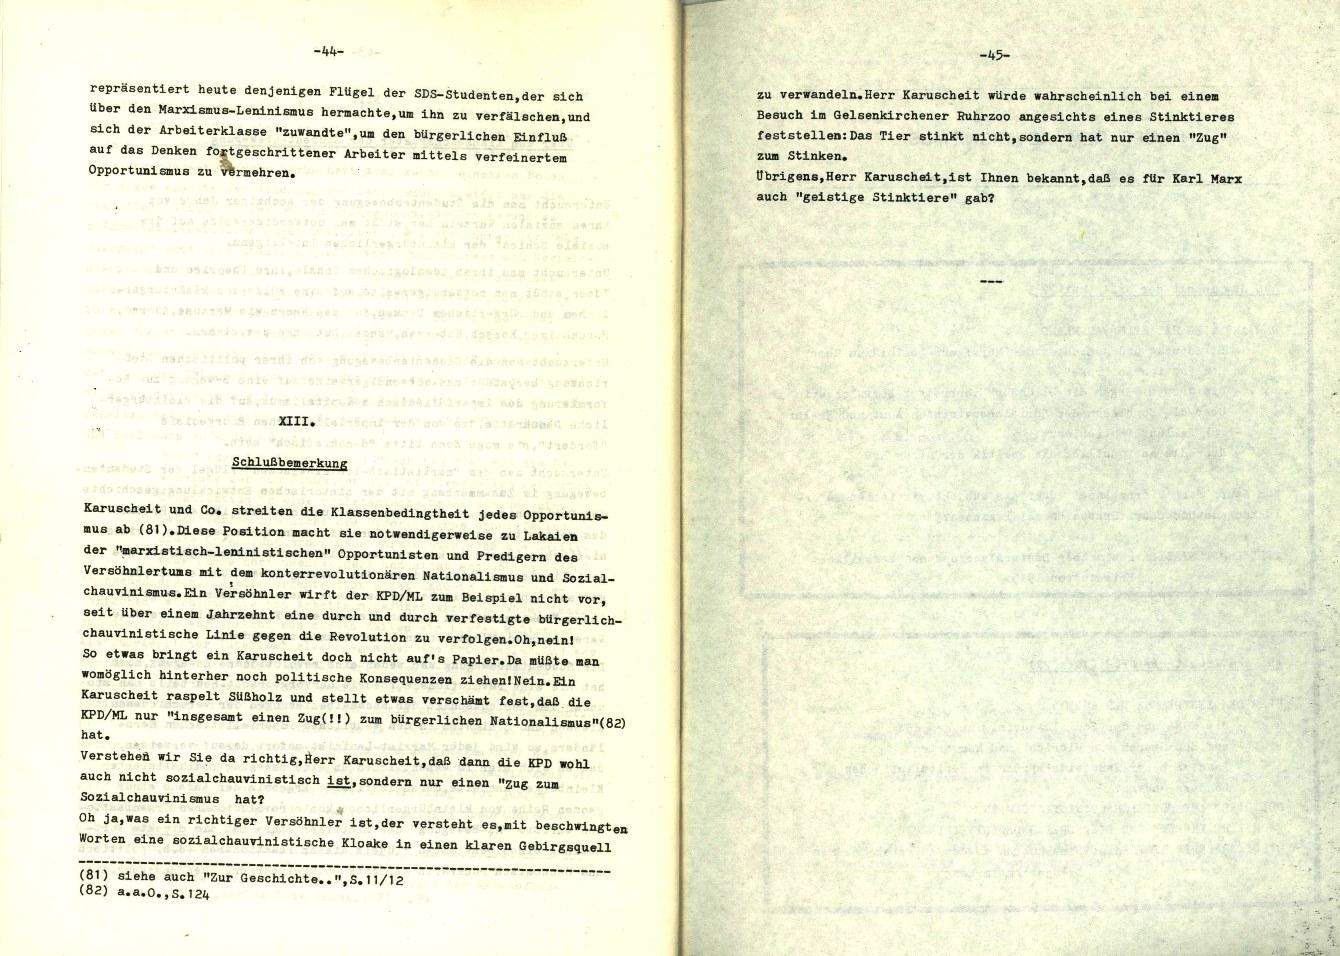 Muenchen_Kampf_dem_Revisionismus_1979_09_23